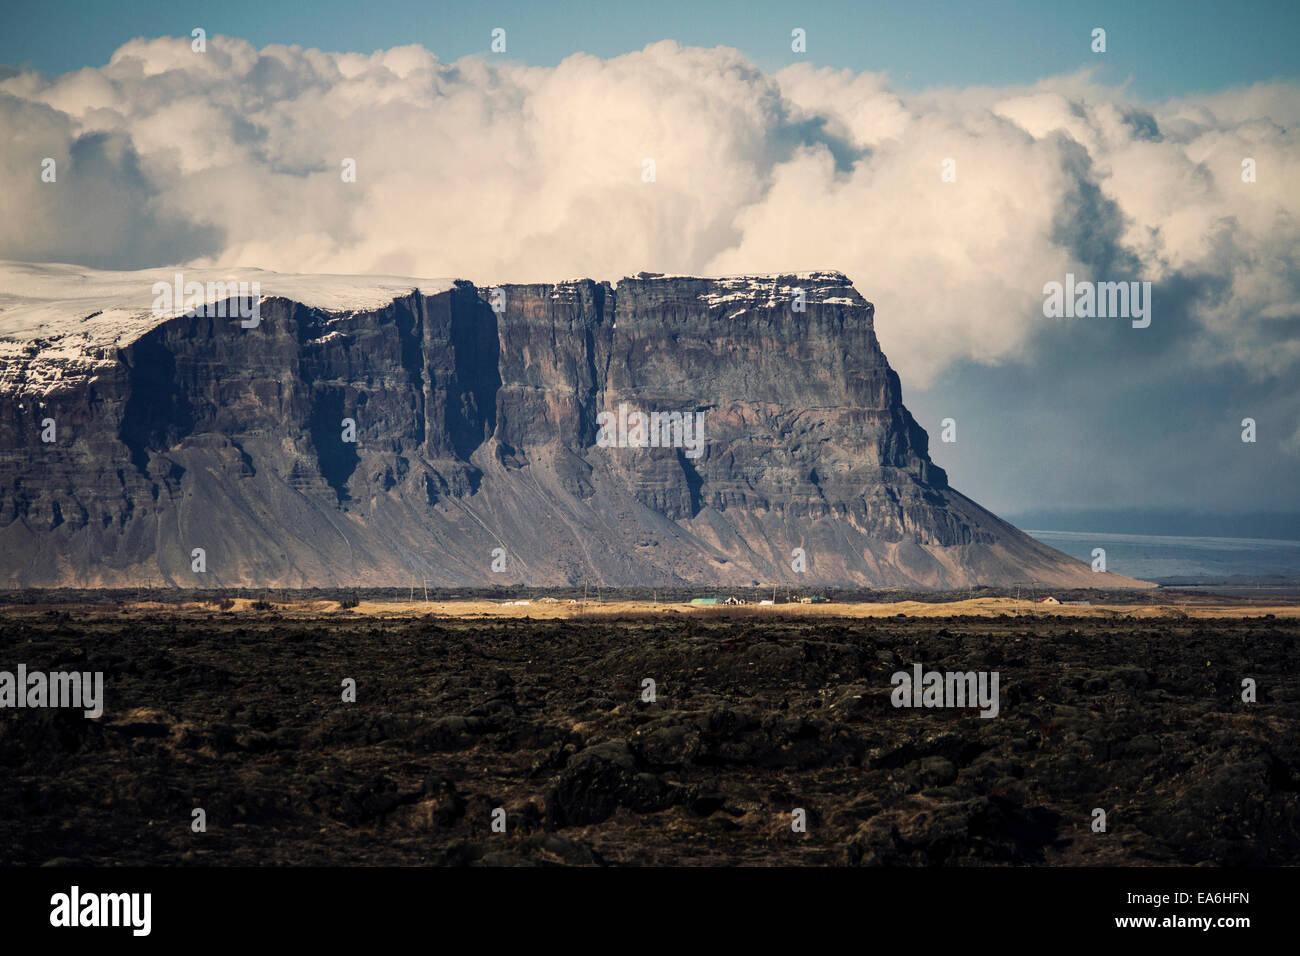 Iceland, Majestic cliffs - Stock Image